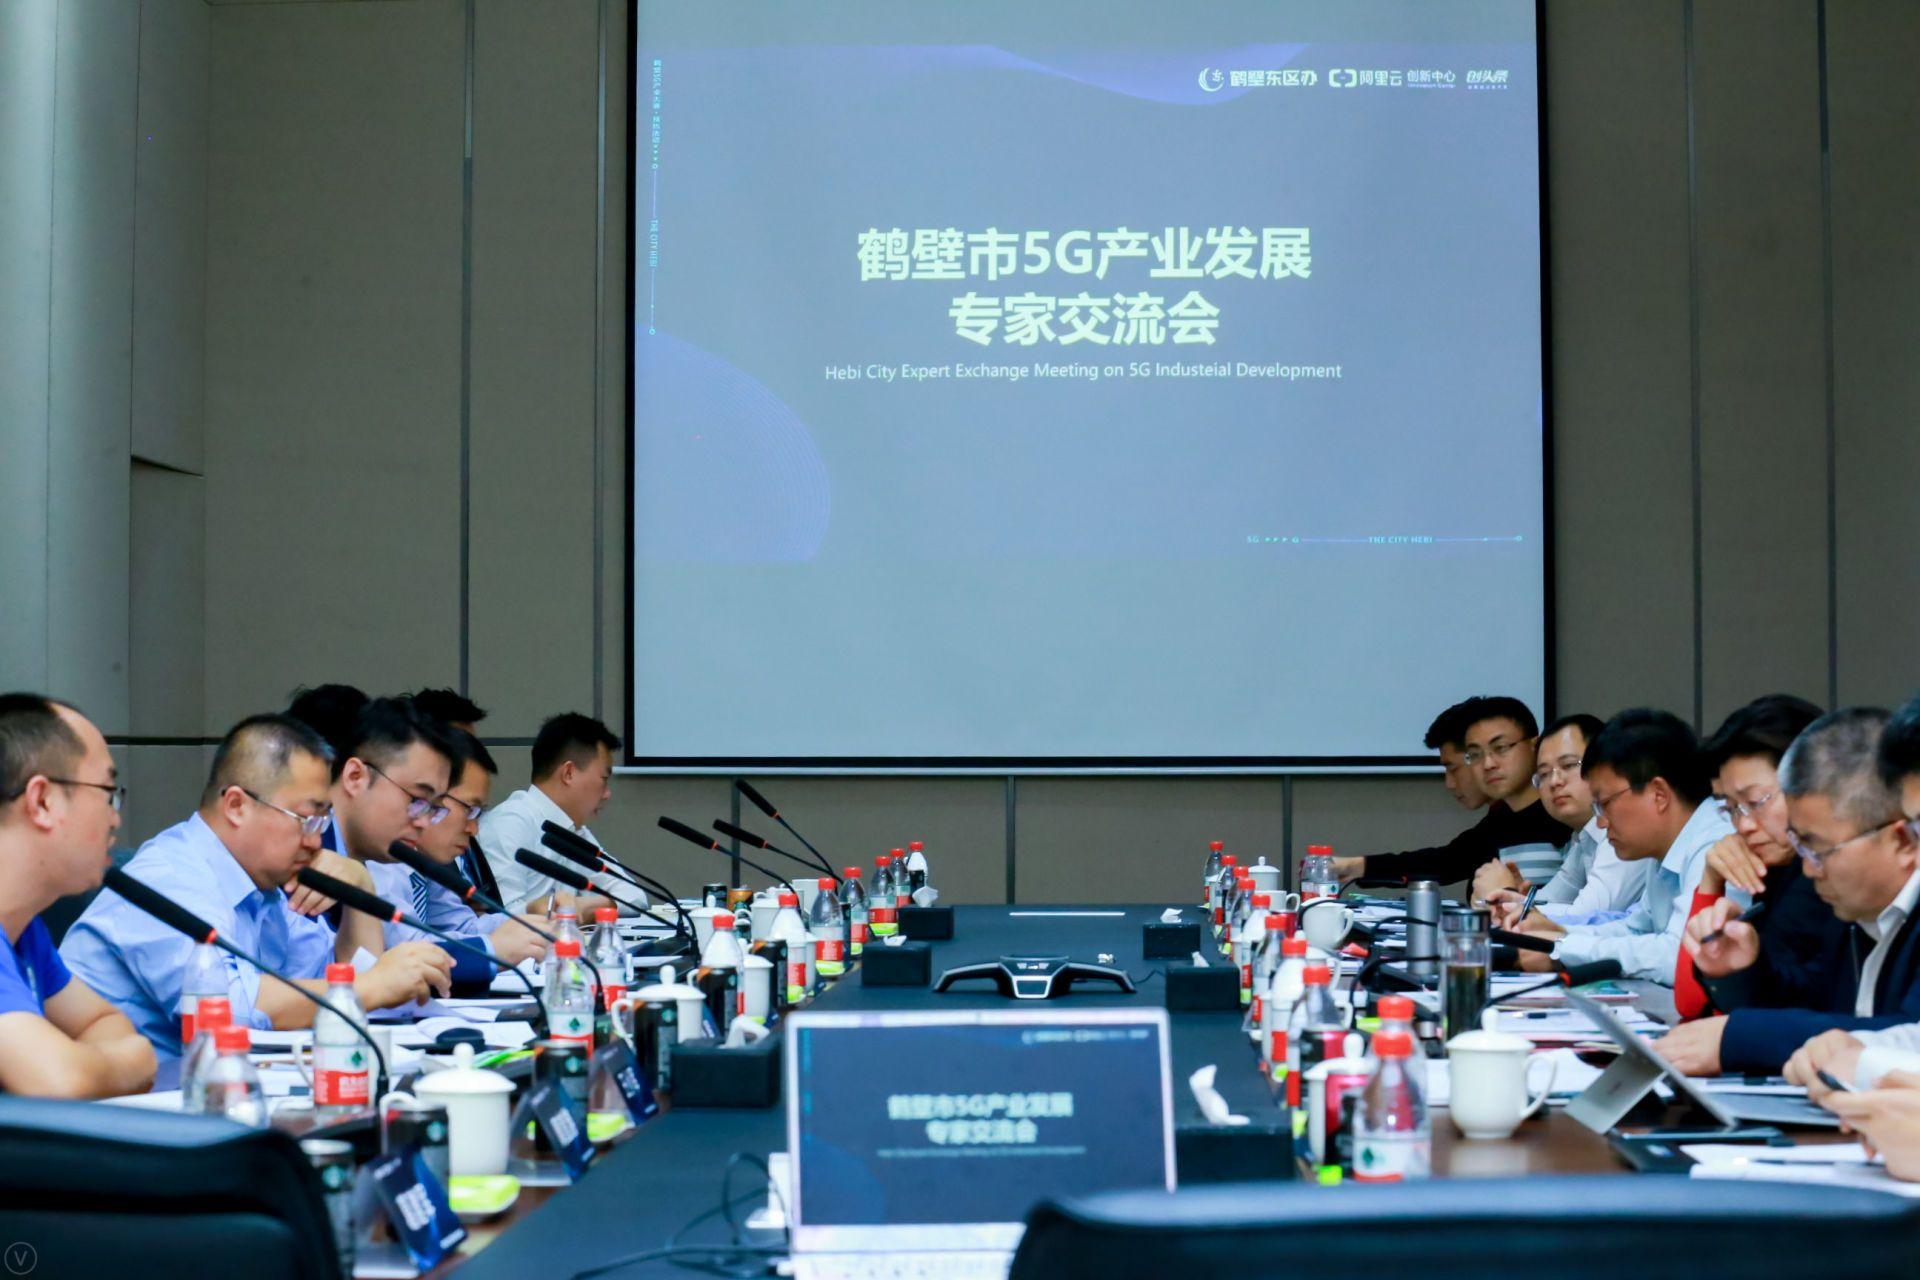 5G产业专家献策鹤壁市,共同把脉产业升级